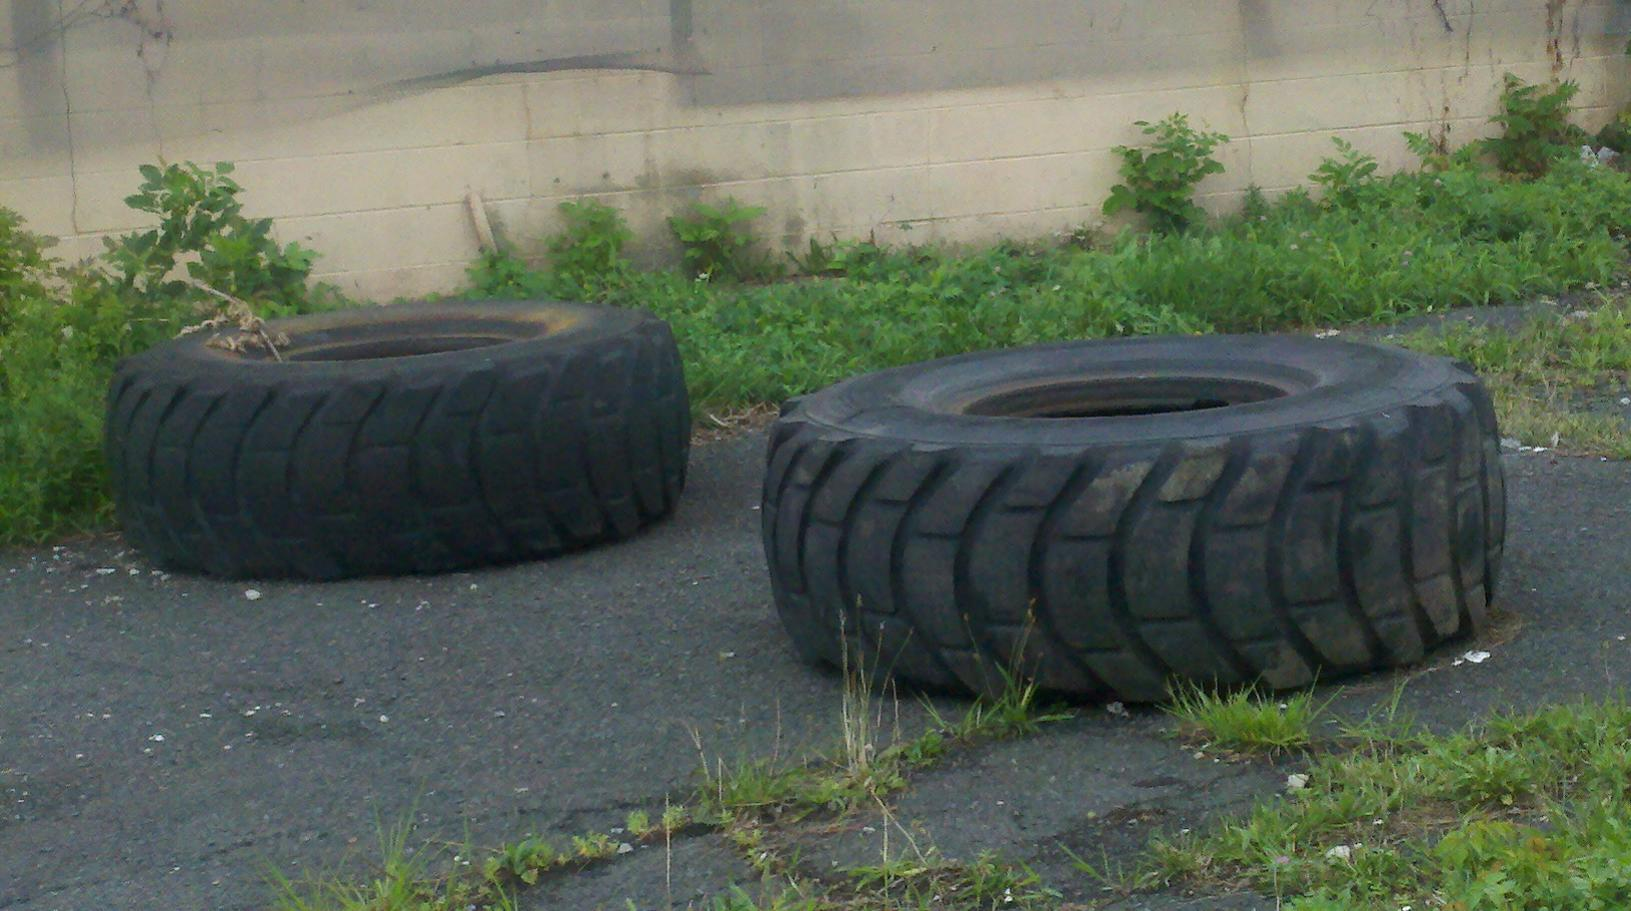 Anyone done a Tough Mudder?-2012-08-11_10-47-42_192.jpg